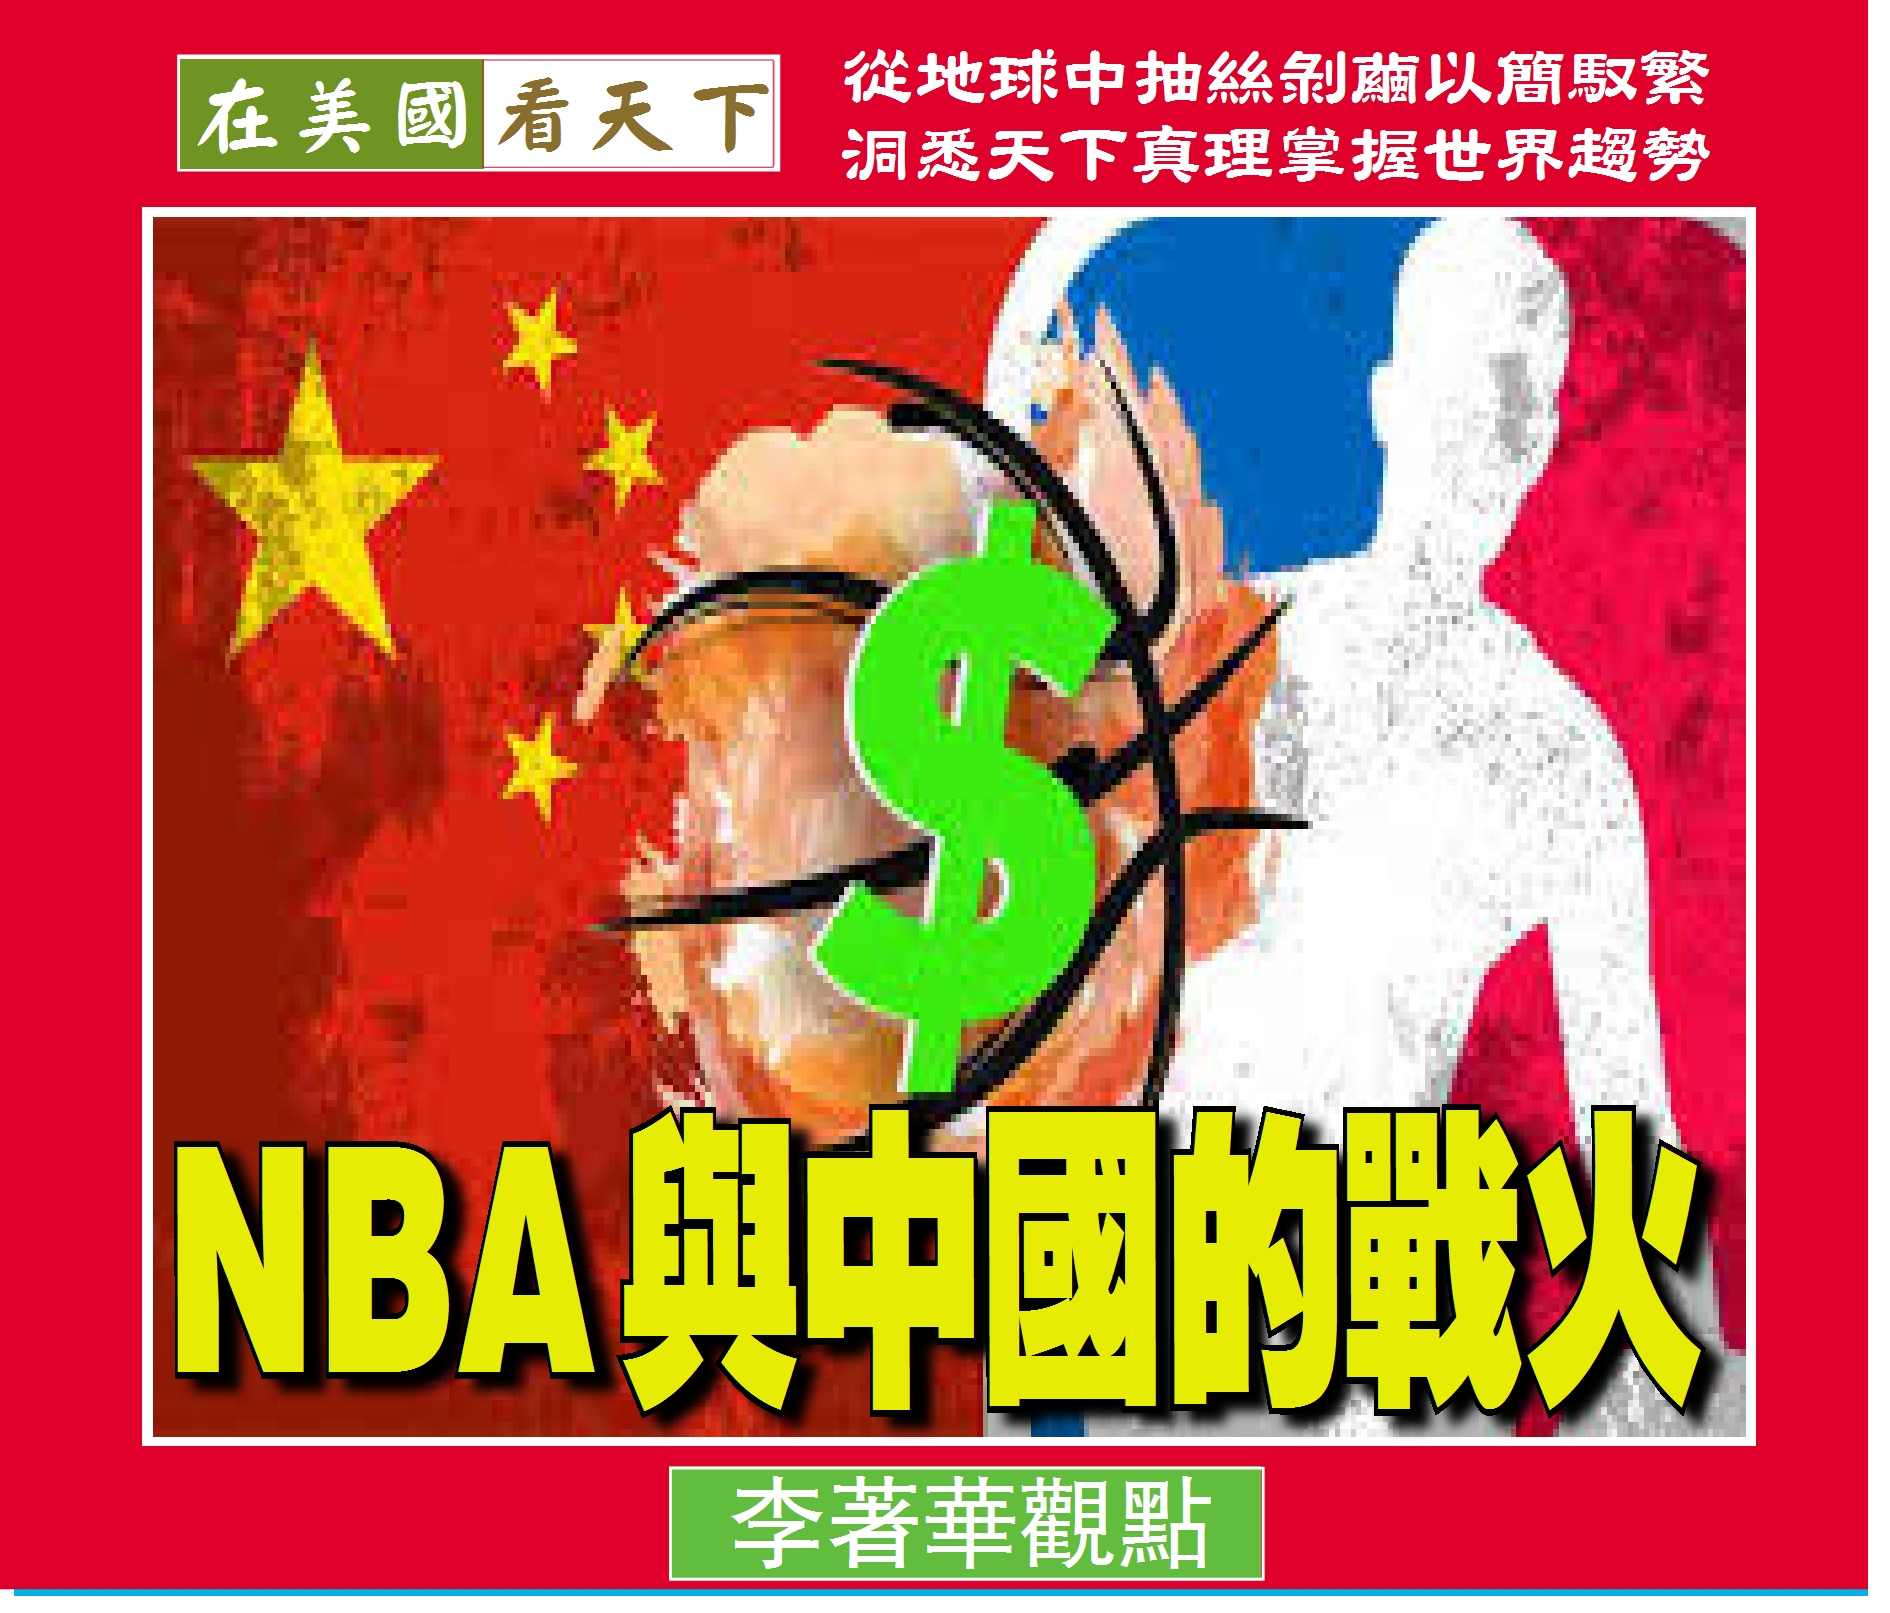 101119-NBA與中國的戰火-1